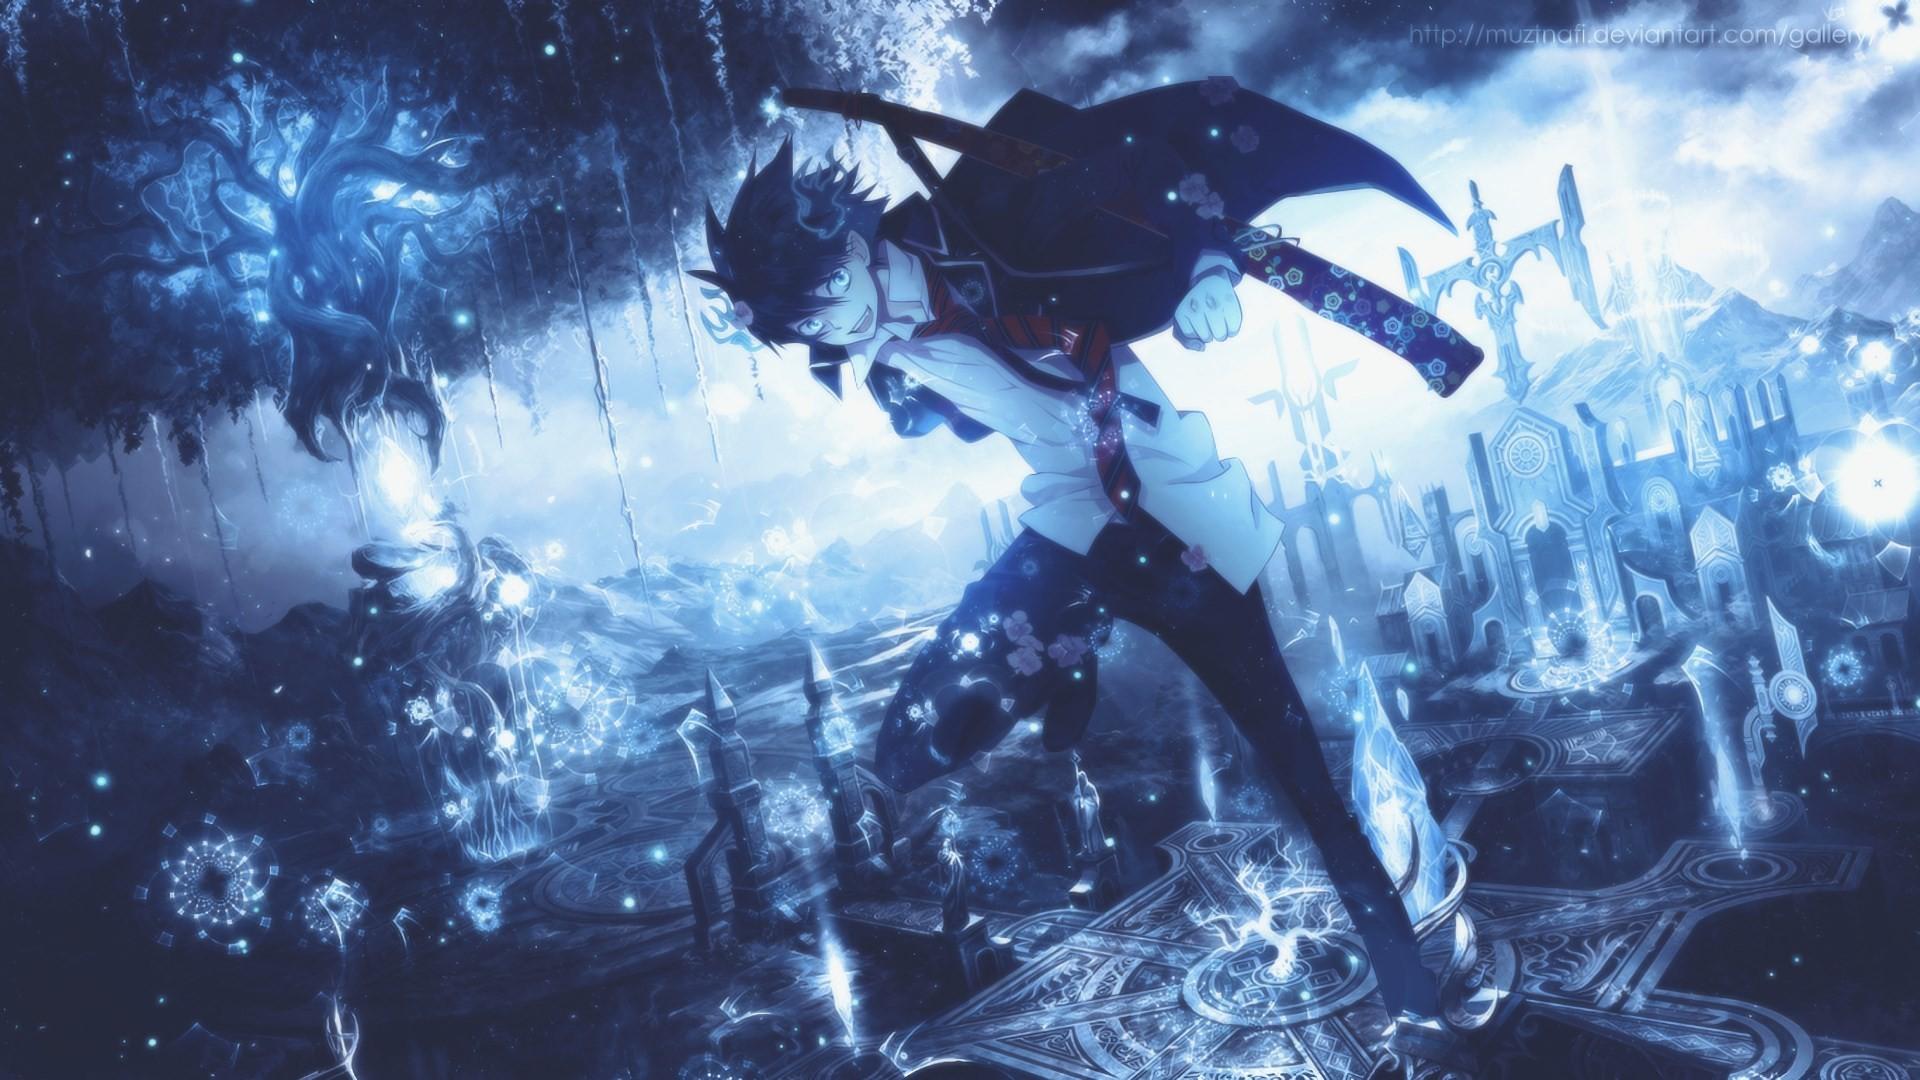 Blue Exorcist Wallpaper (67+ images)